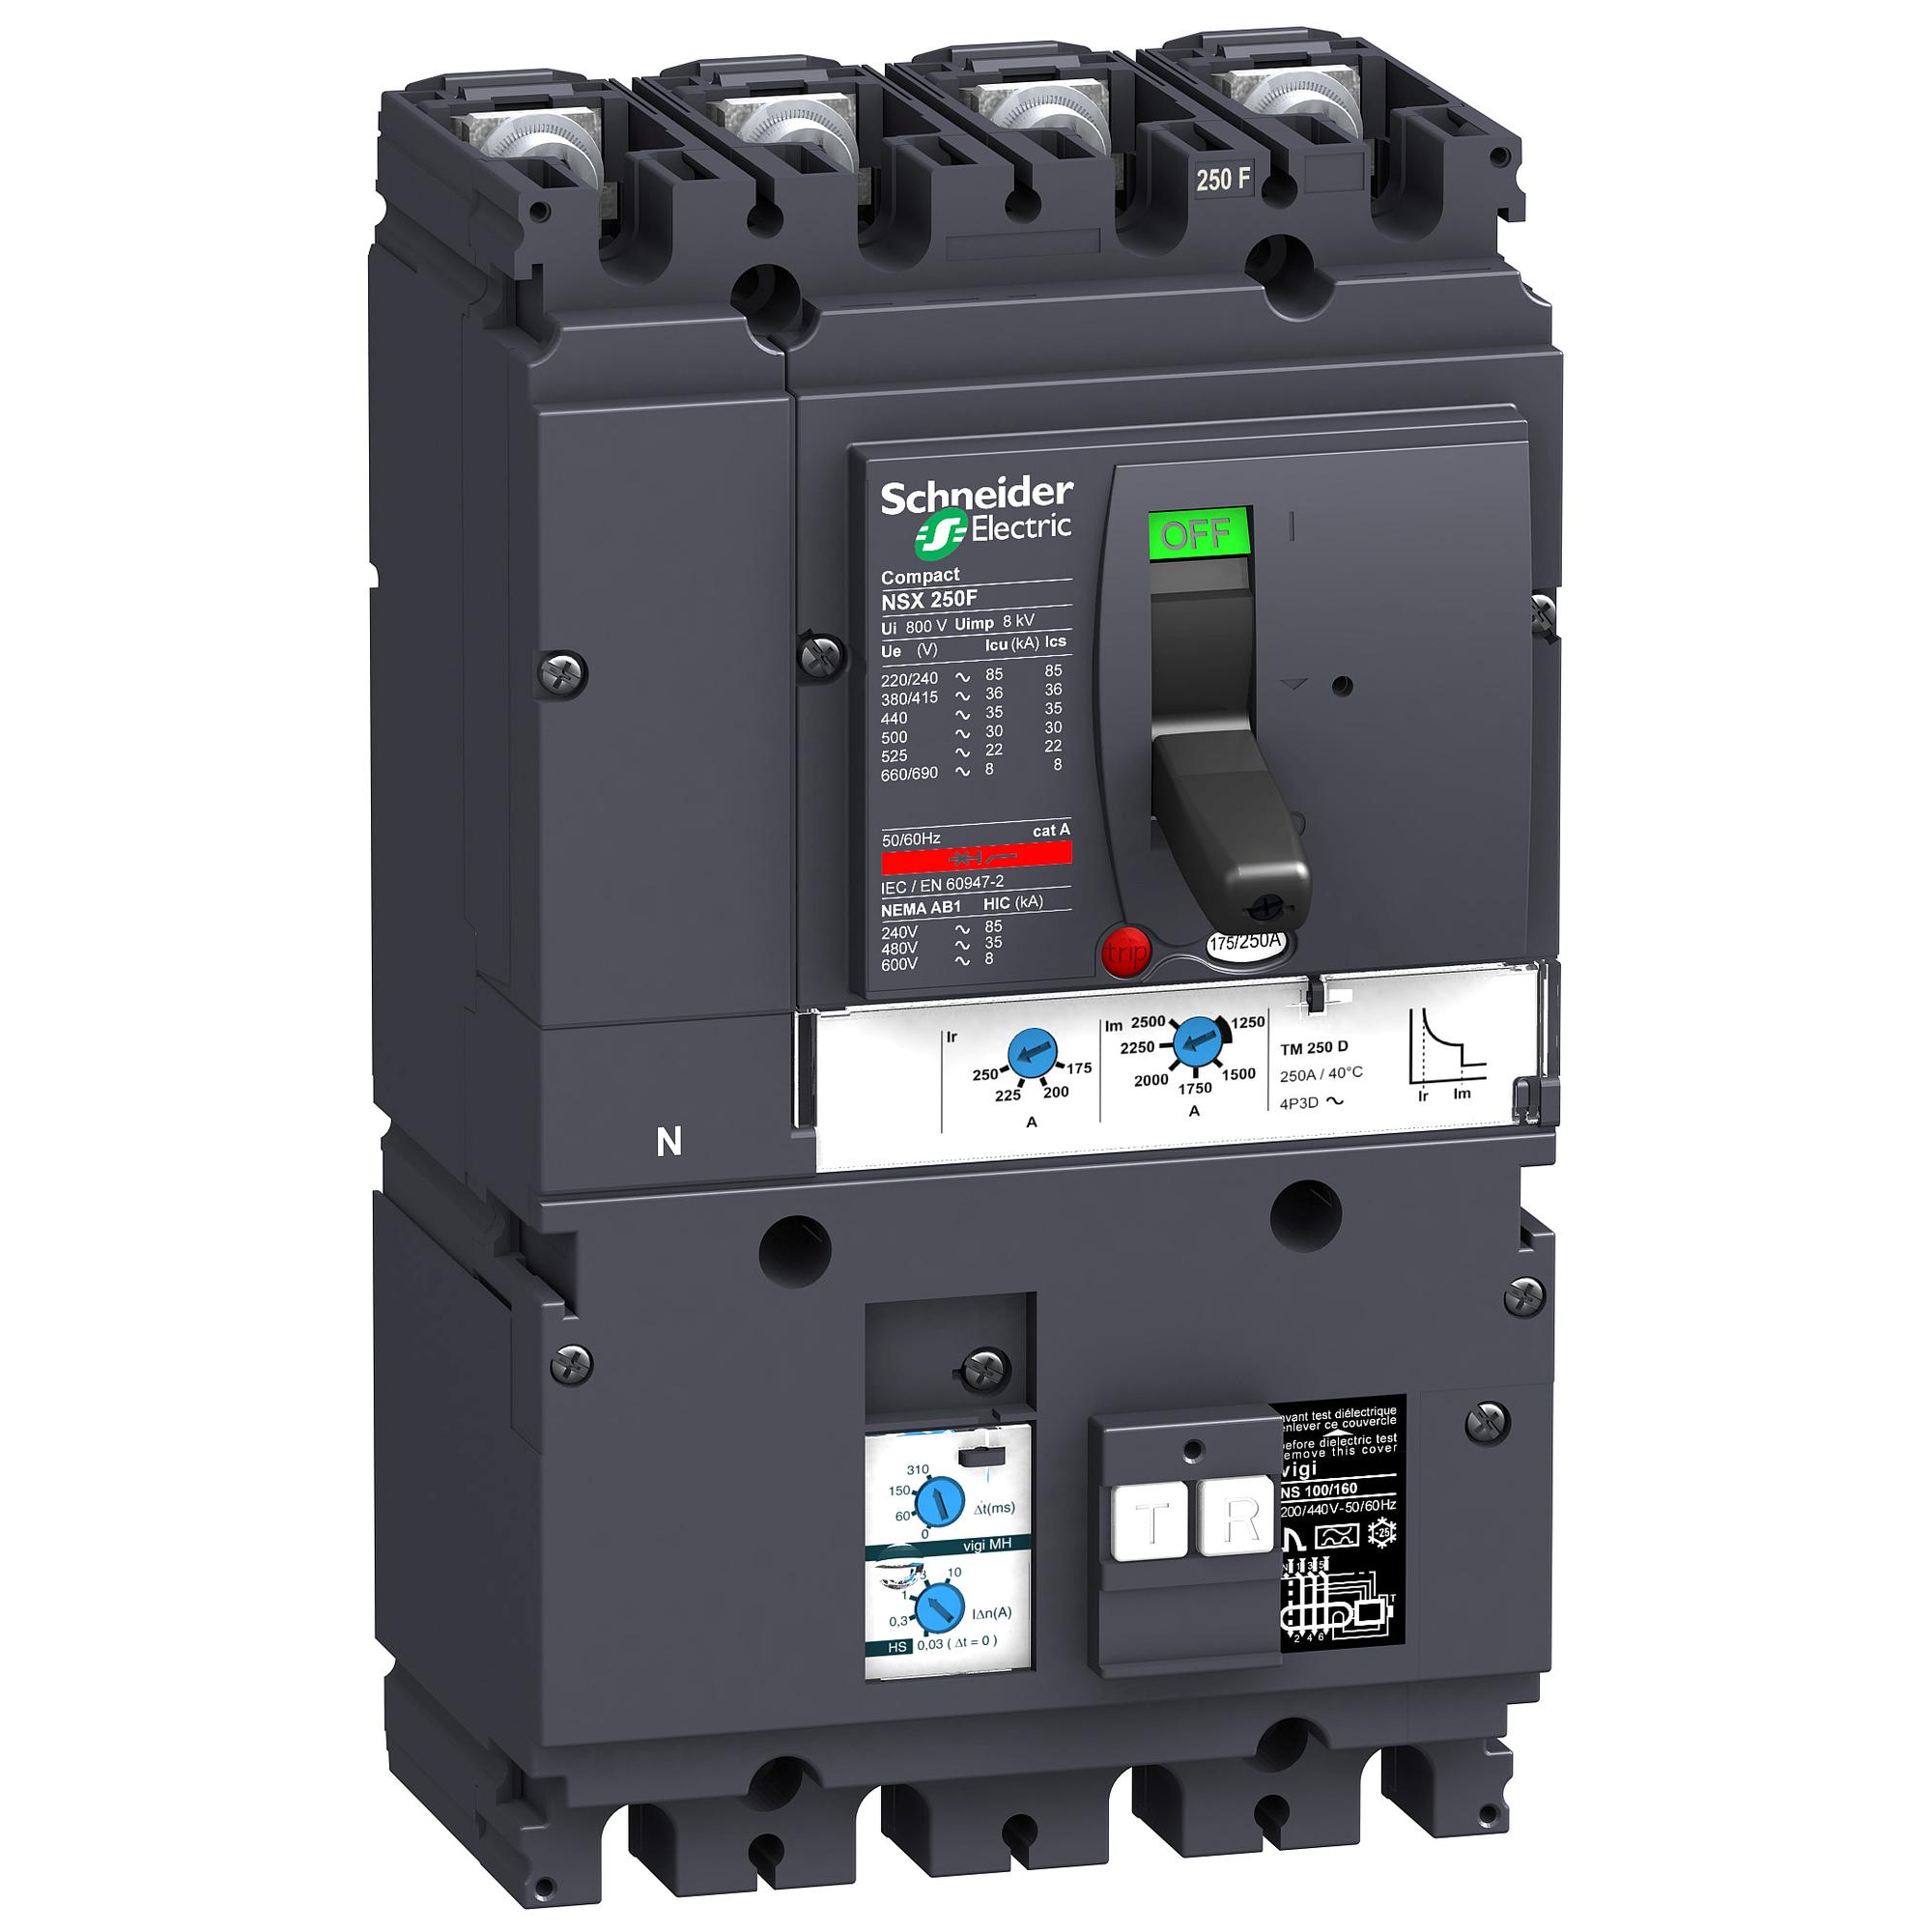 Image Description for https://tedi.itc-electronics.com/itcmedia/images/20190624/LV431911_SCHNEIDERELECTRIC_1.jpeg